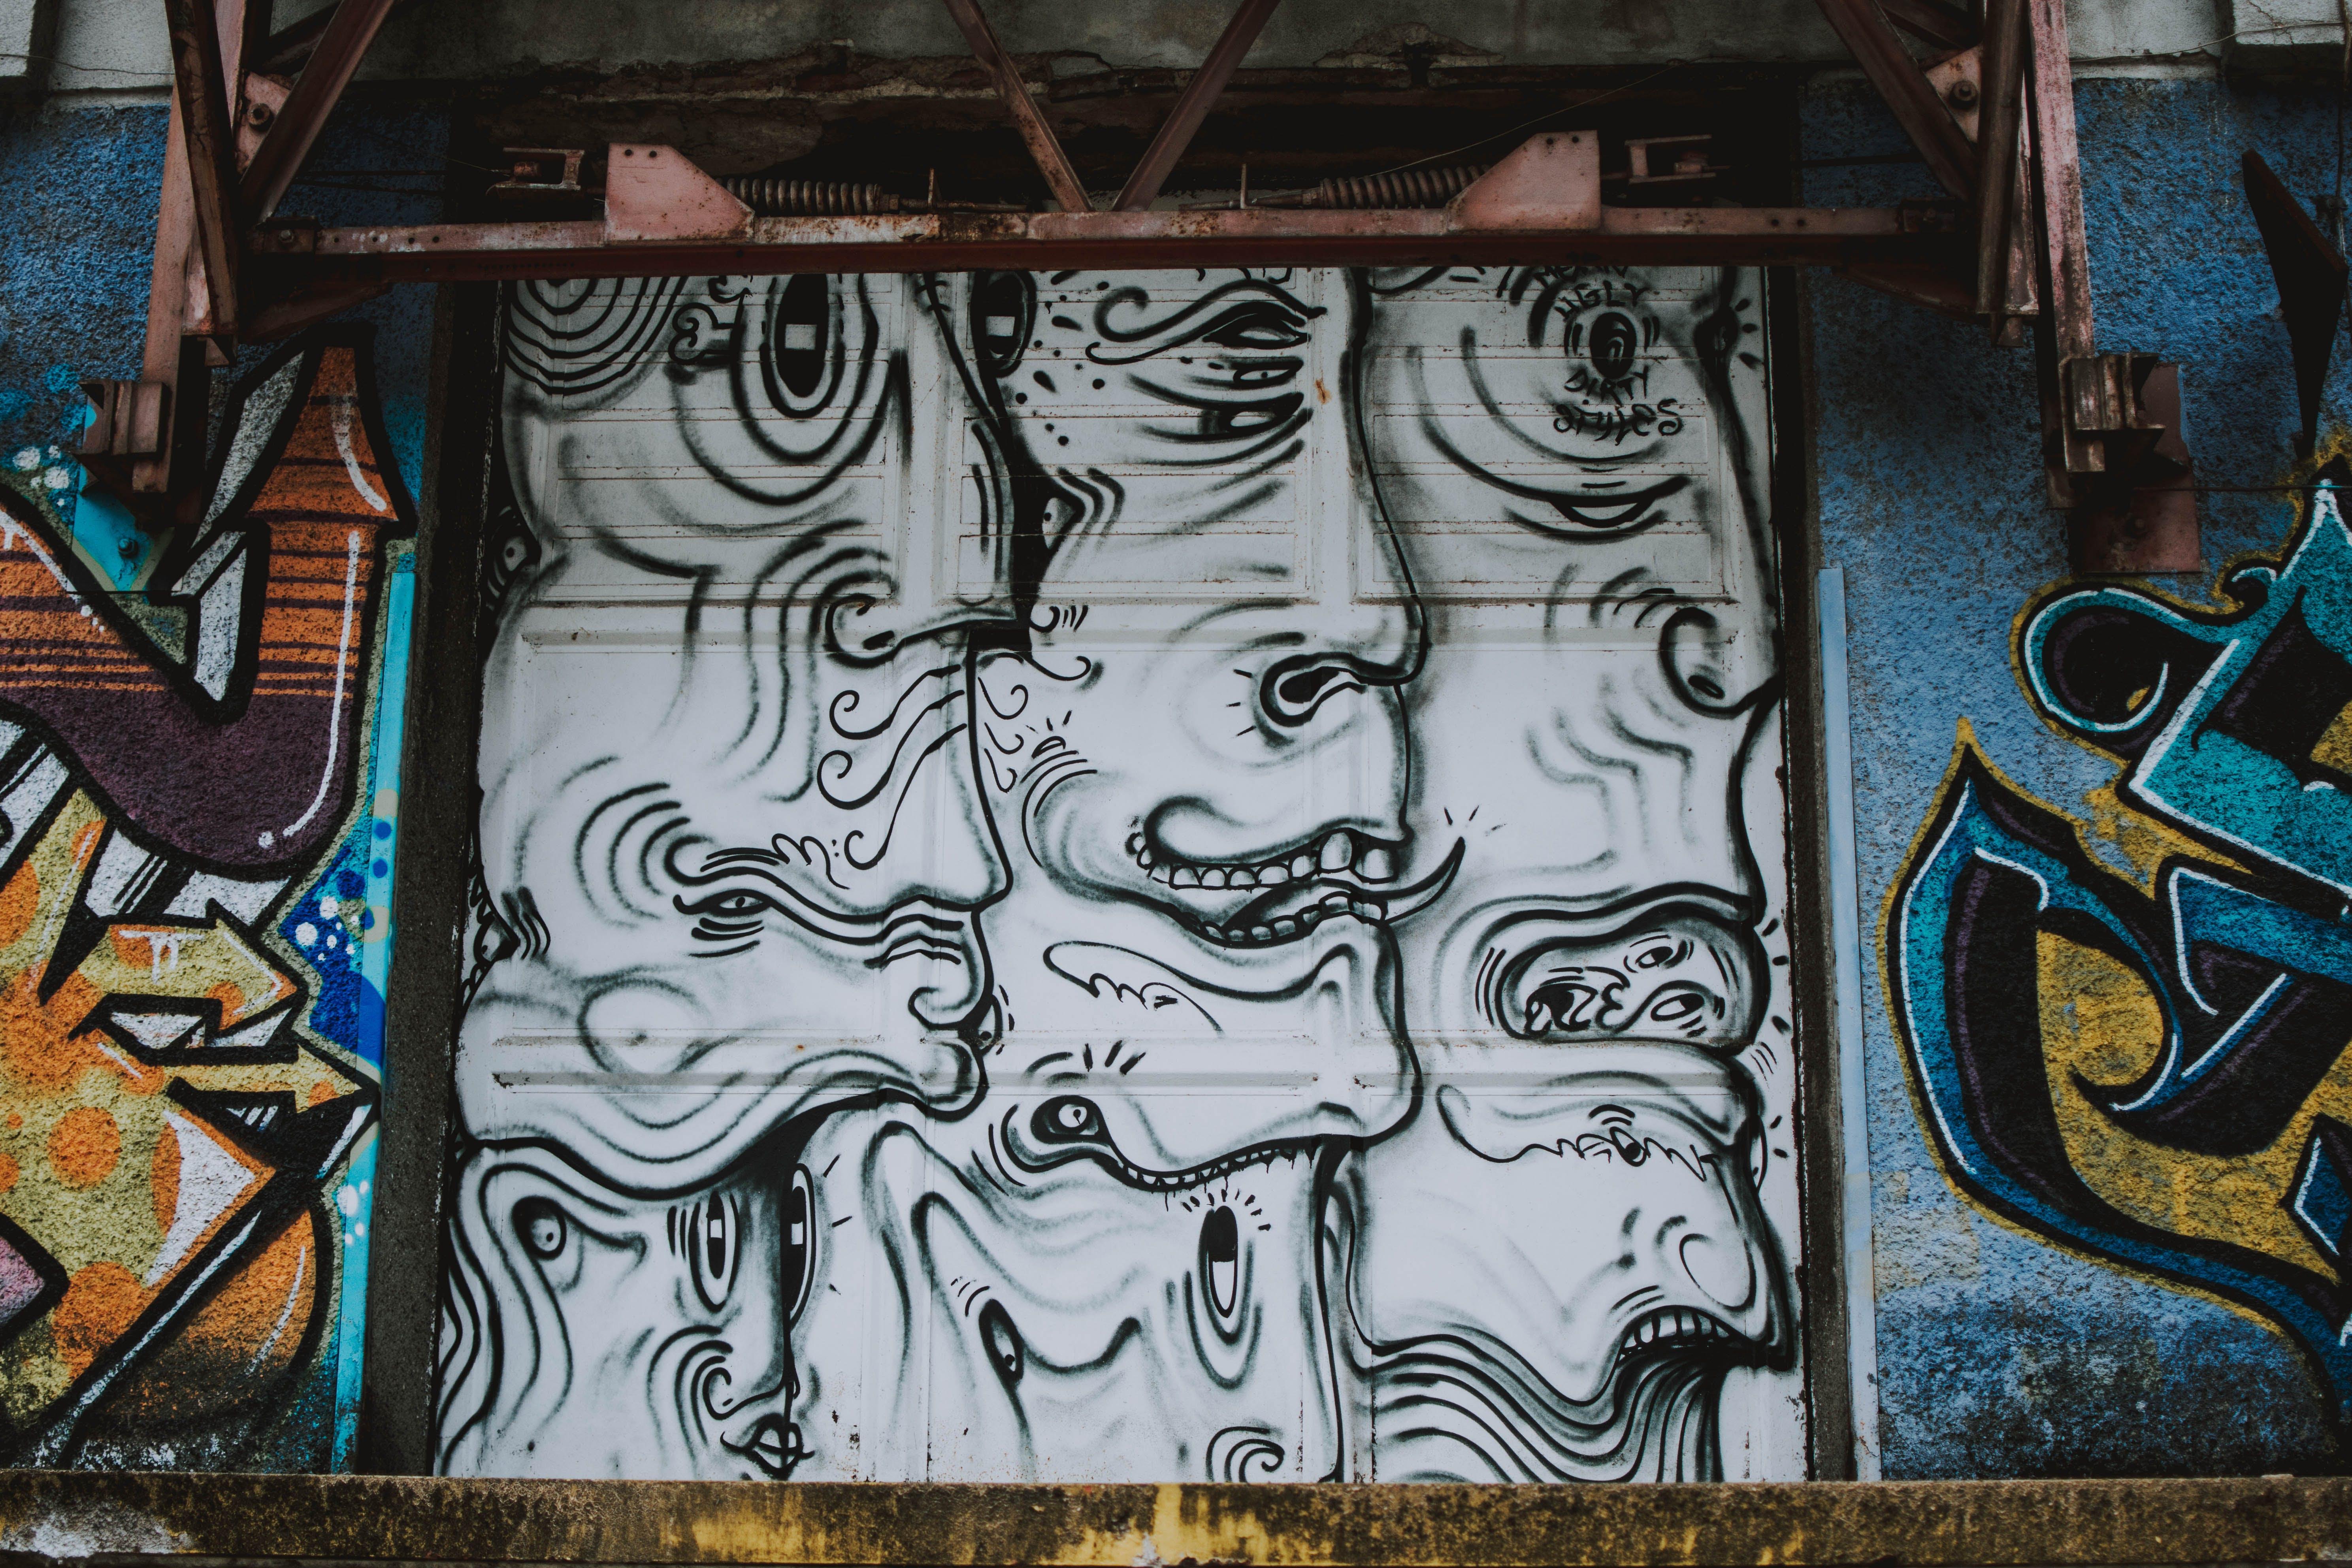 White and Black Graffiti